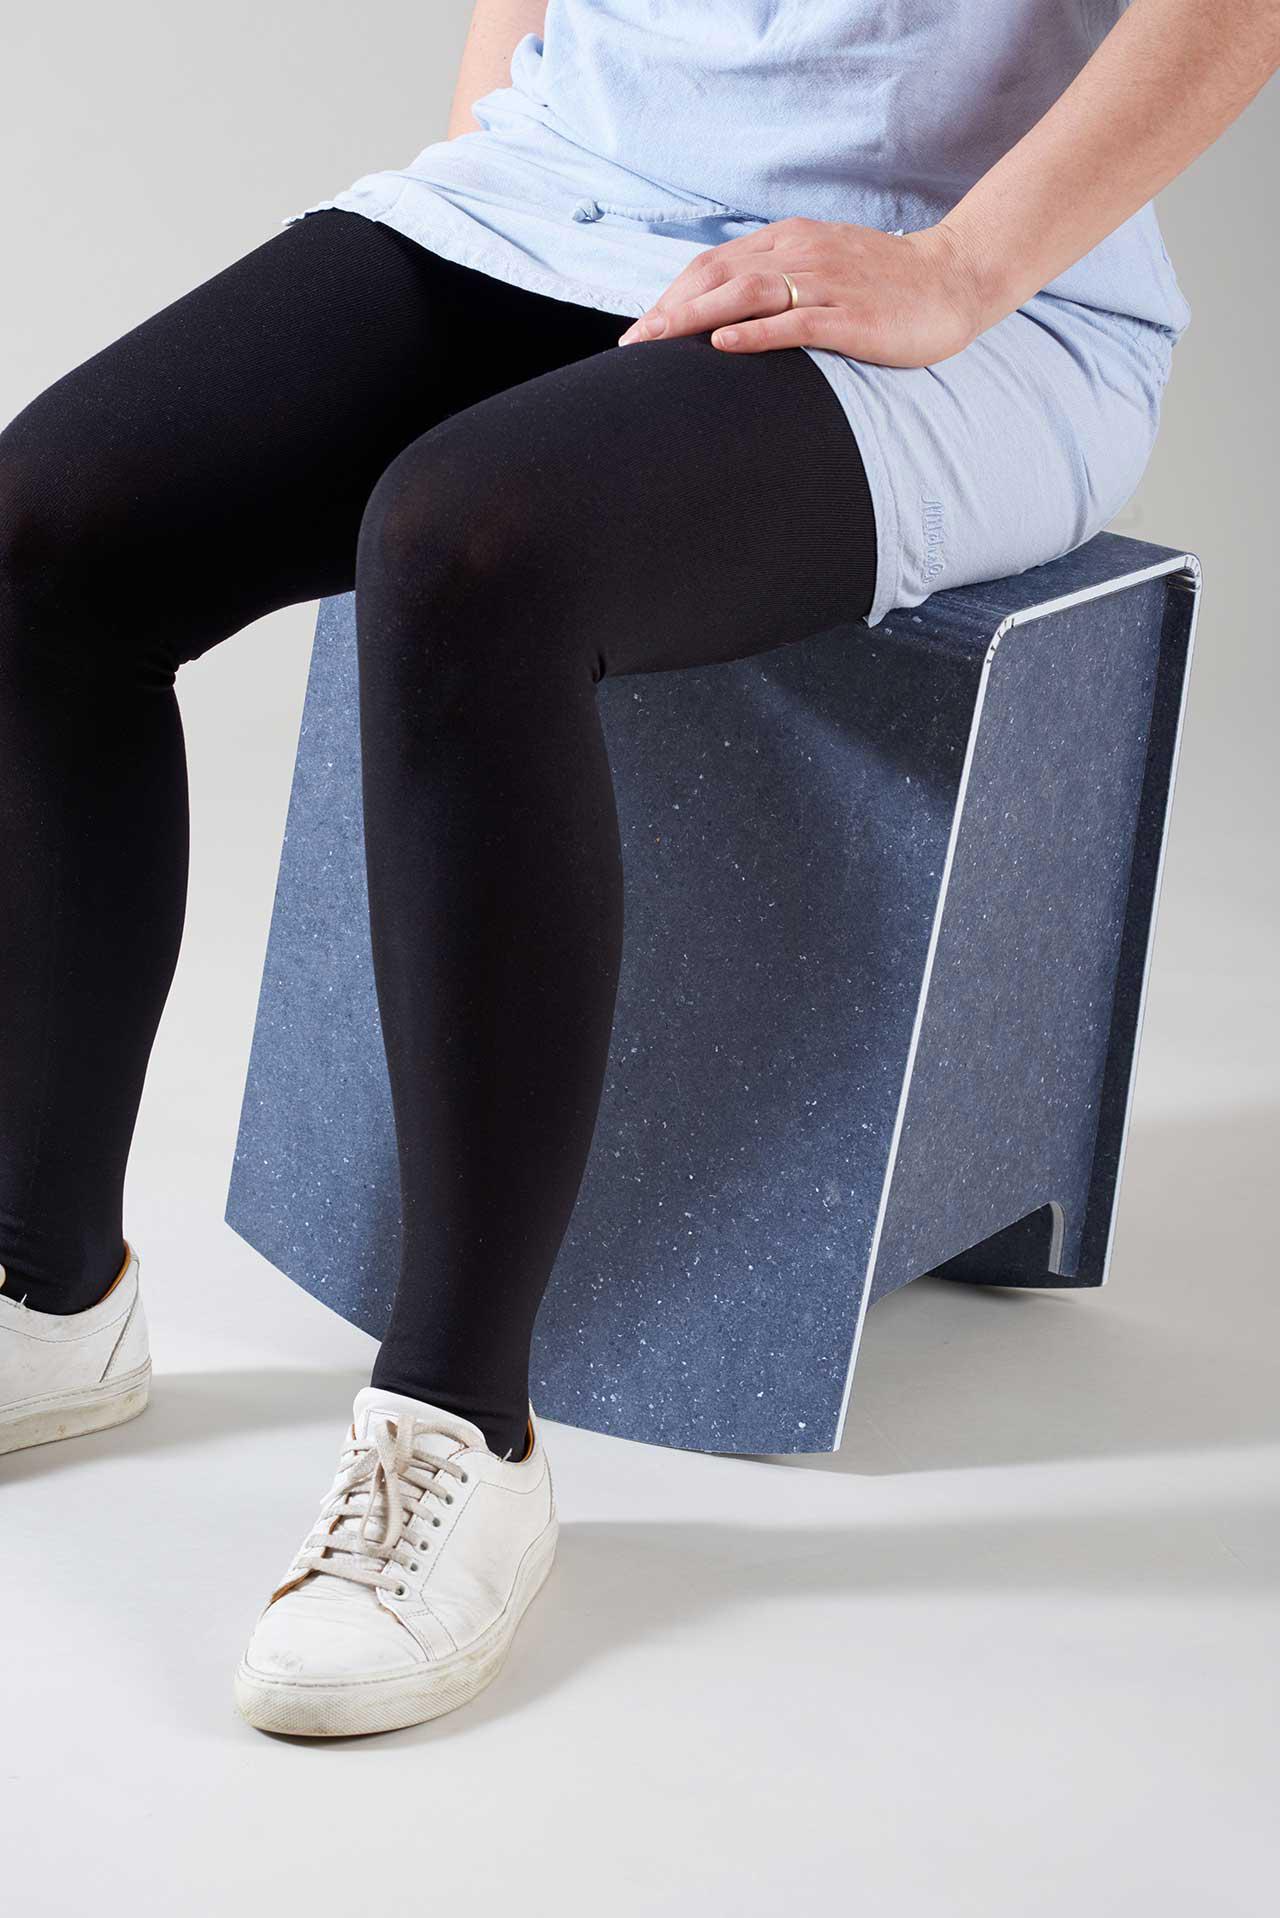 person sitting on rocking stool